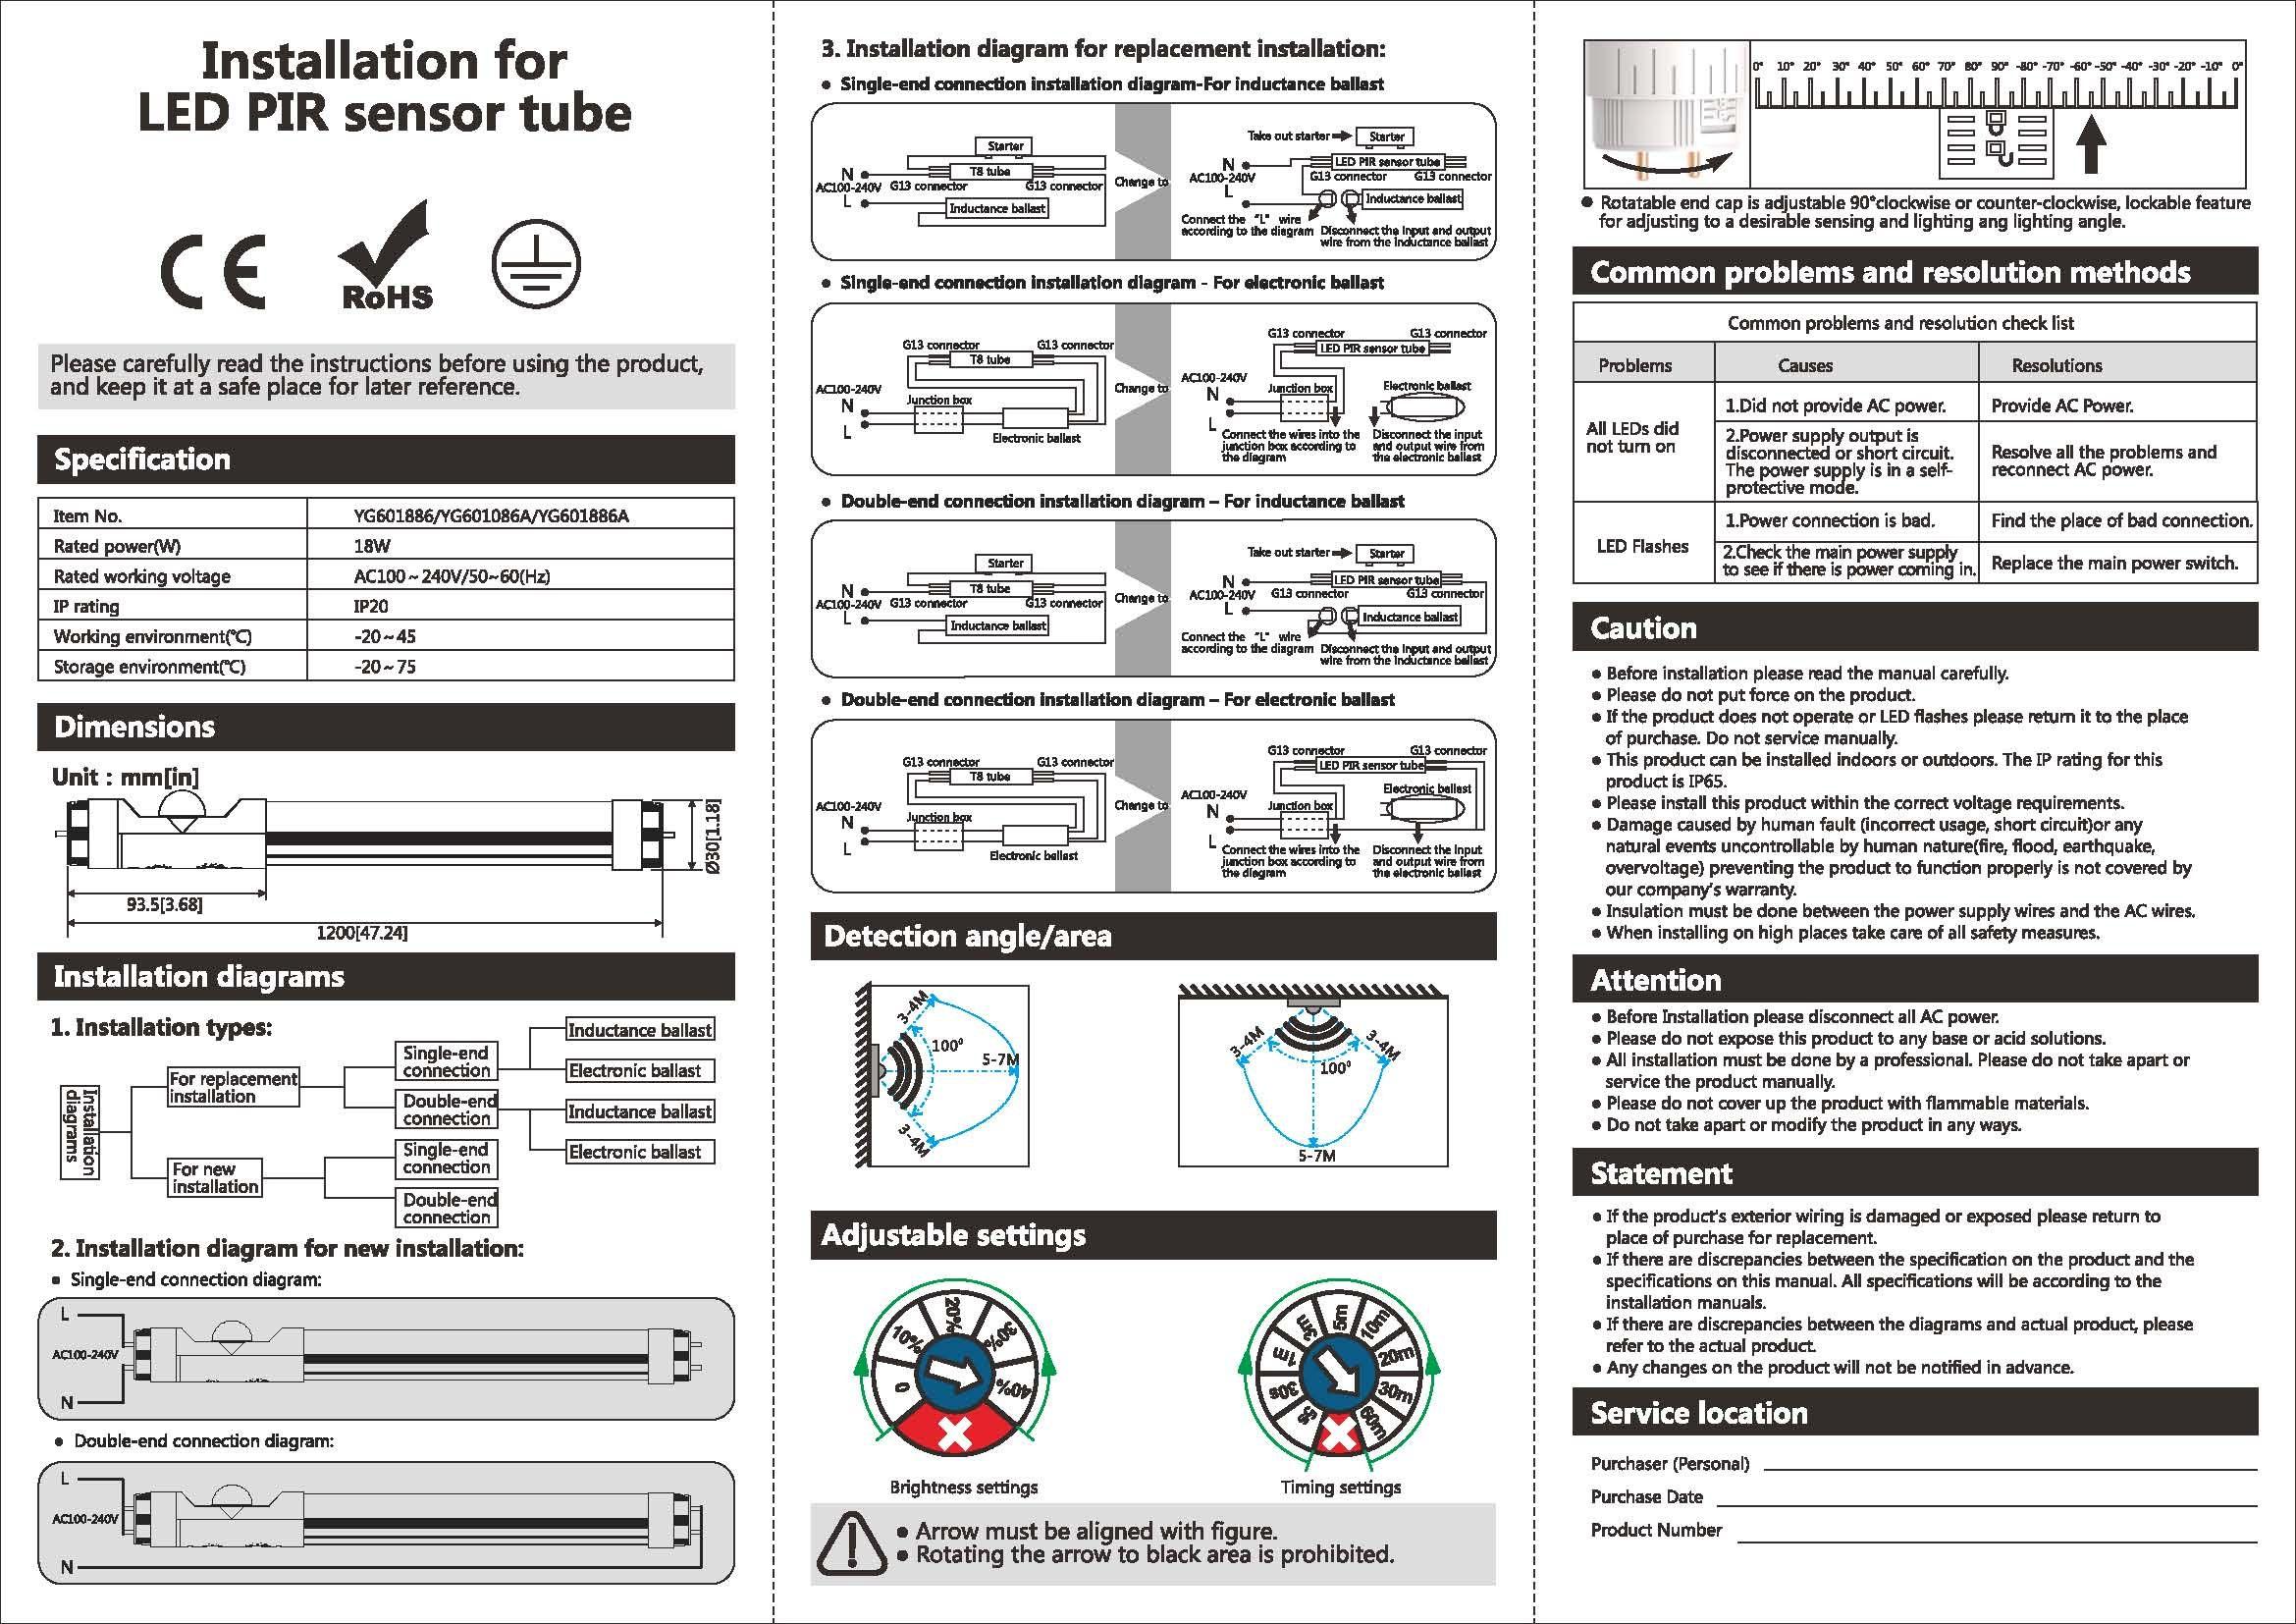 The New Tforceled Smart Pir Motion Sensor T8 Fluorescent Tube Led Light Fixture Wiring Diagrams Instruction Manual For